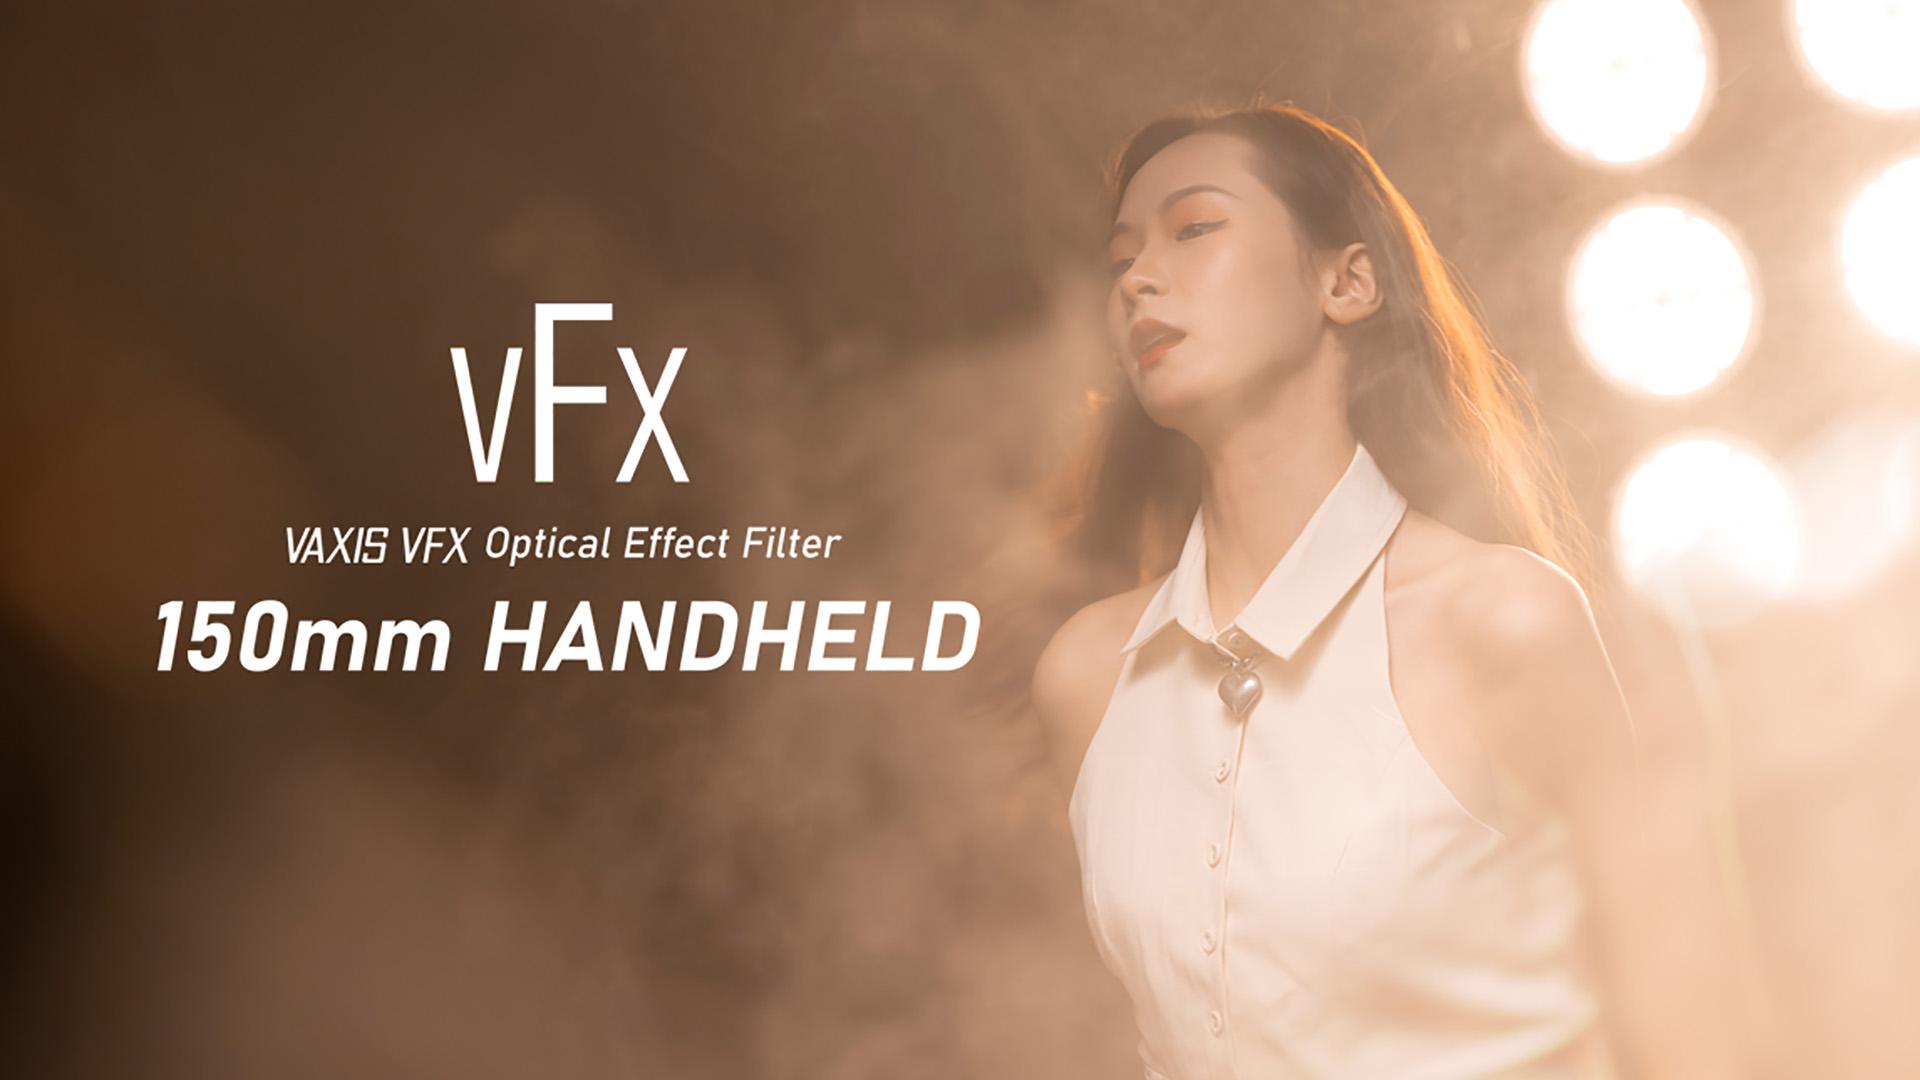 VAXIS威固丨梦之所触—VFX 150mm手持特效镜